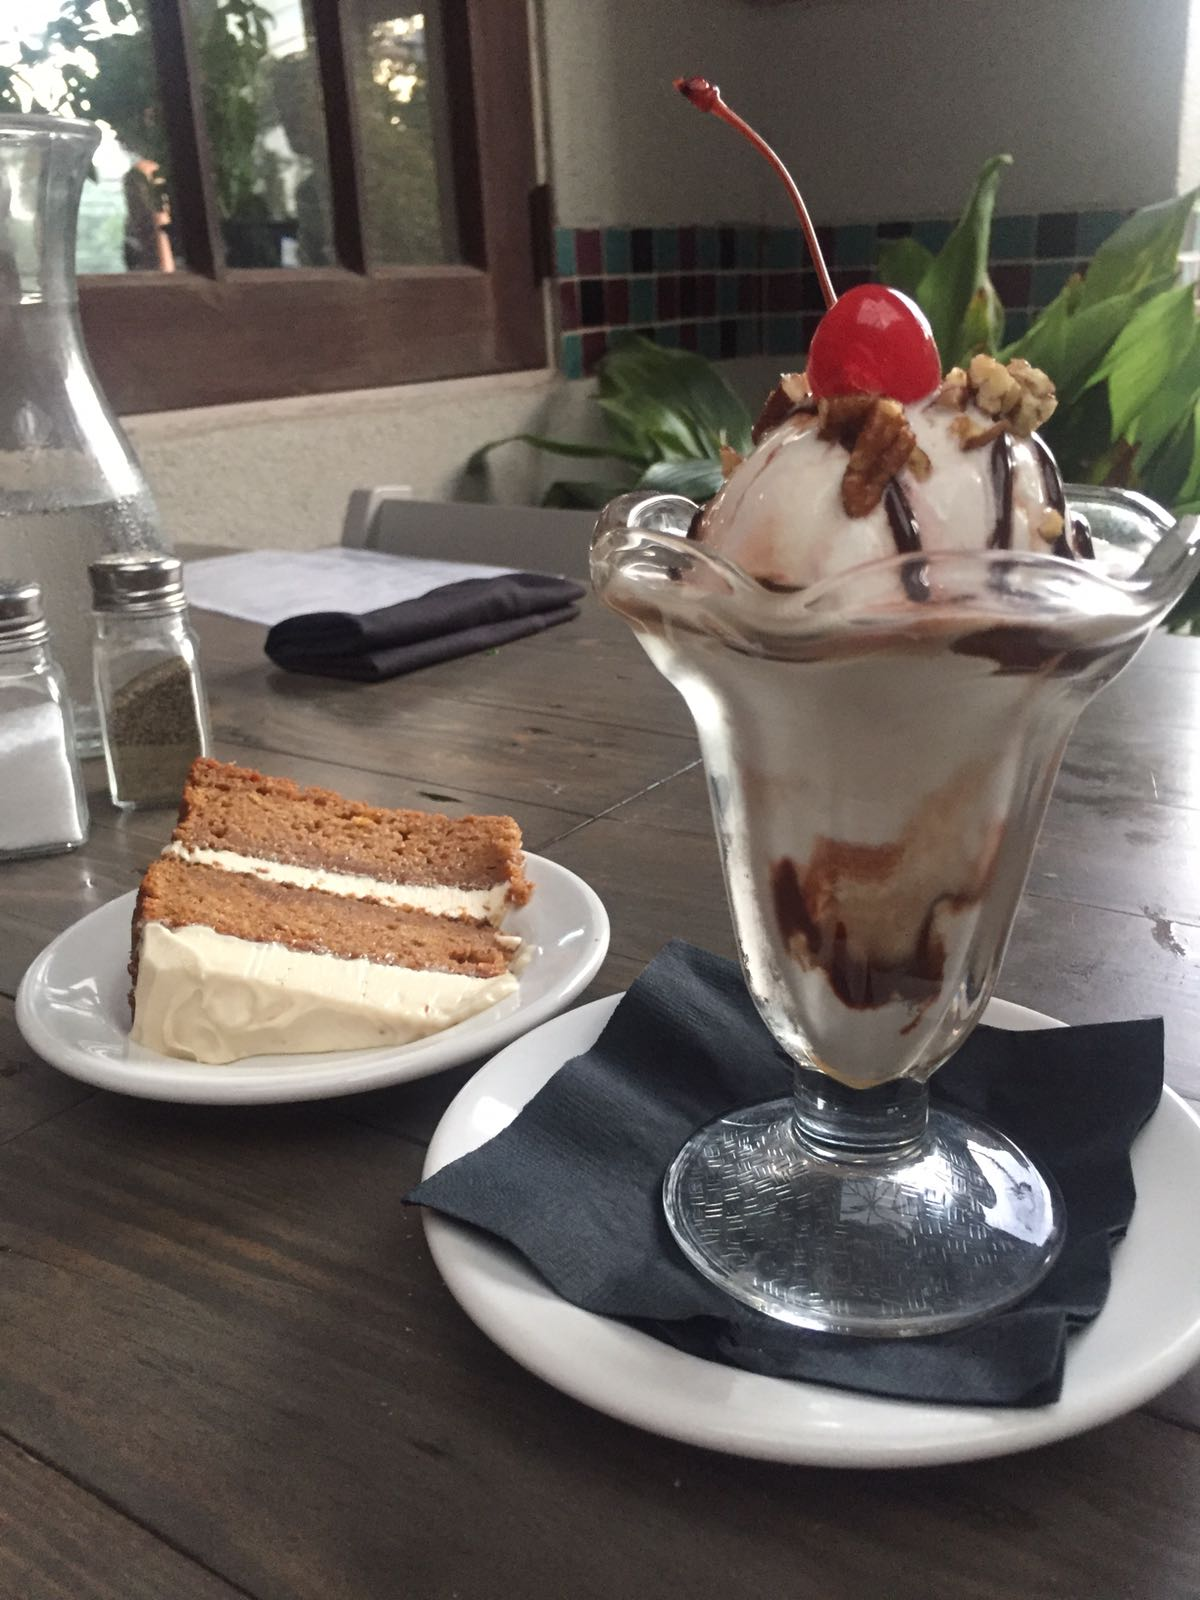 Carrot cake and Ice cream sundae